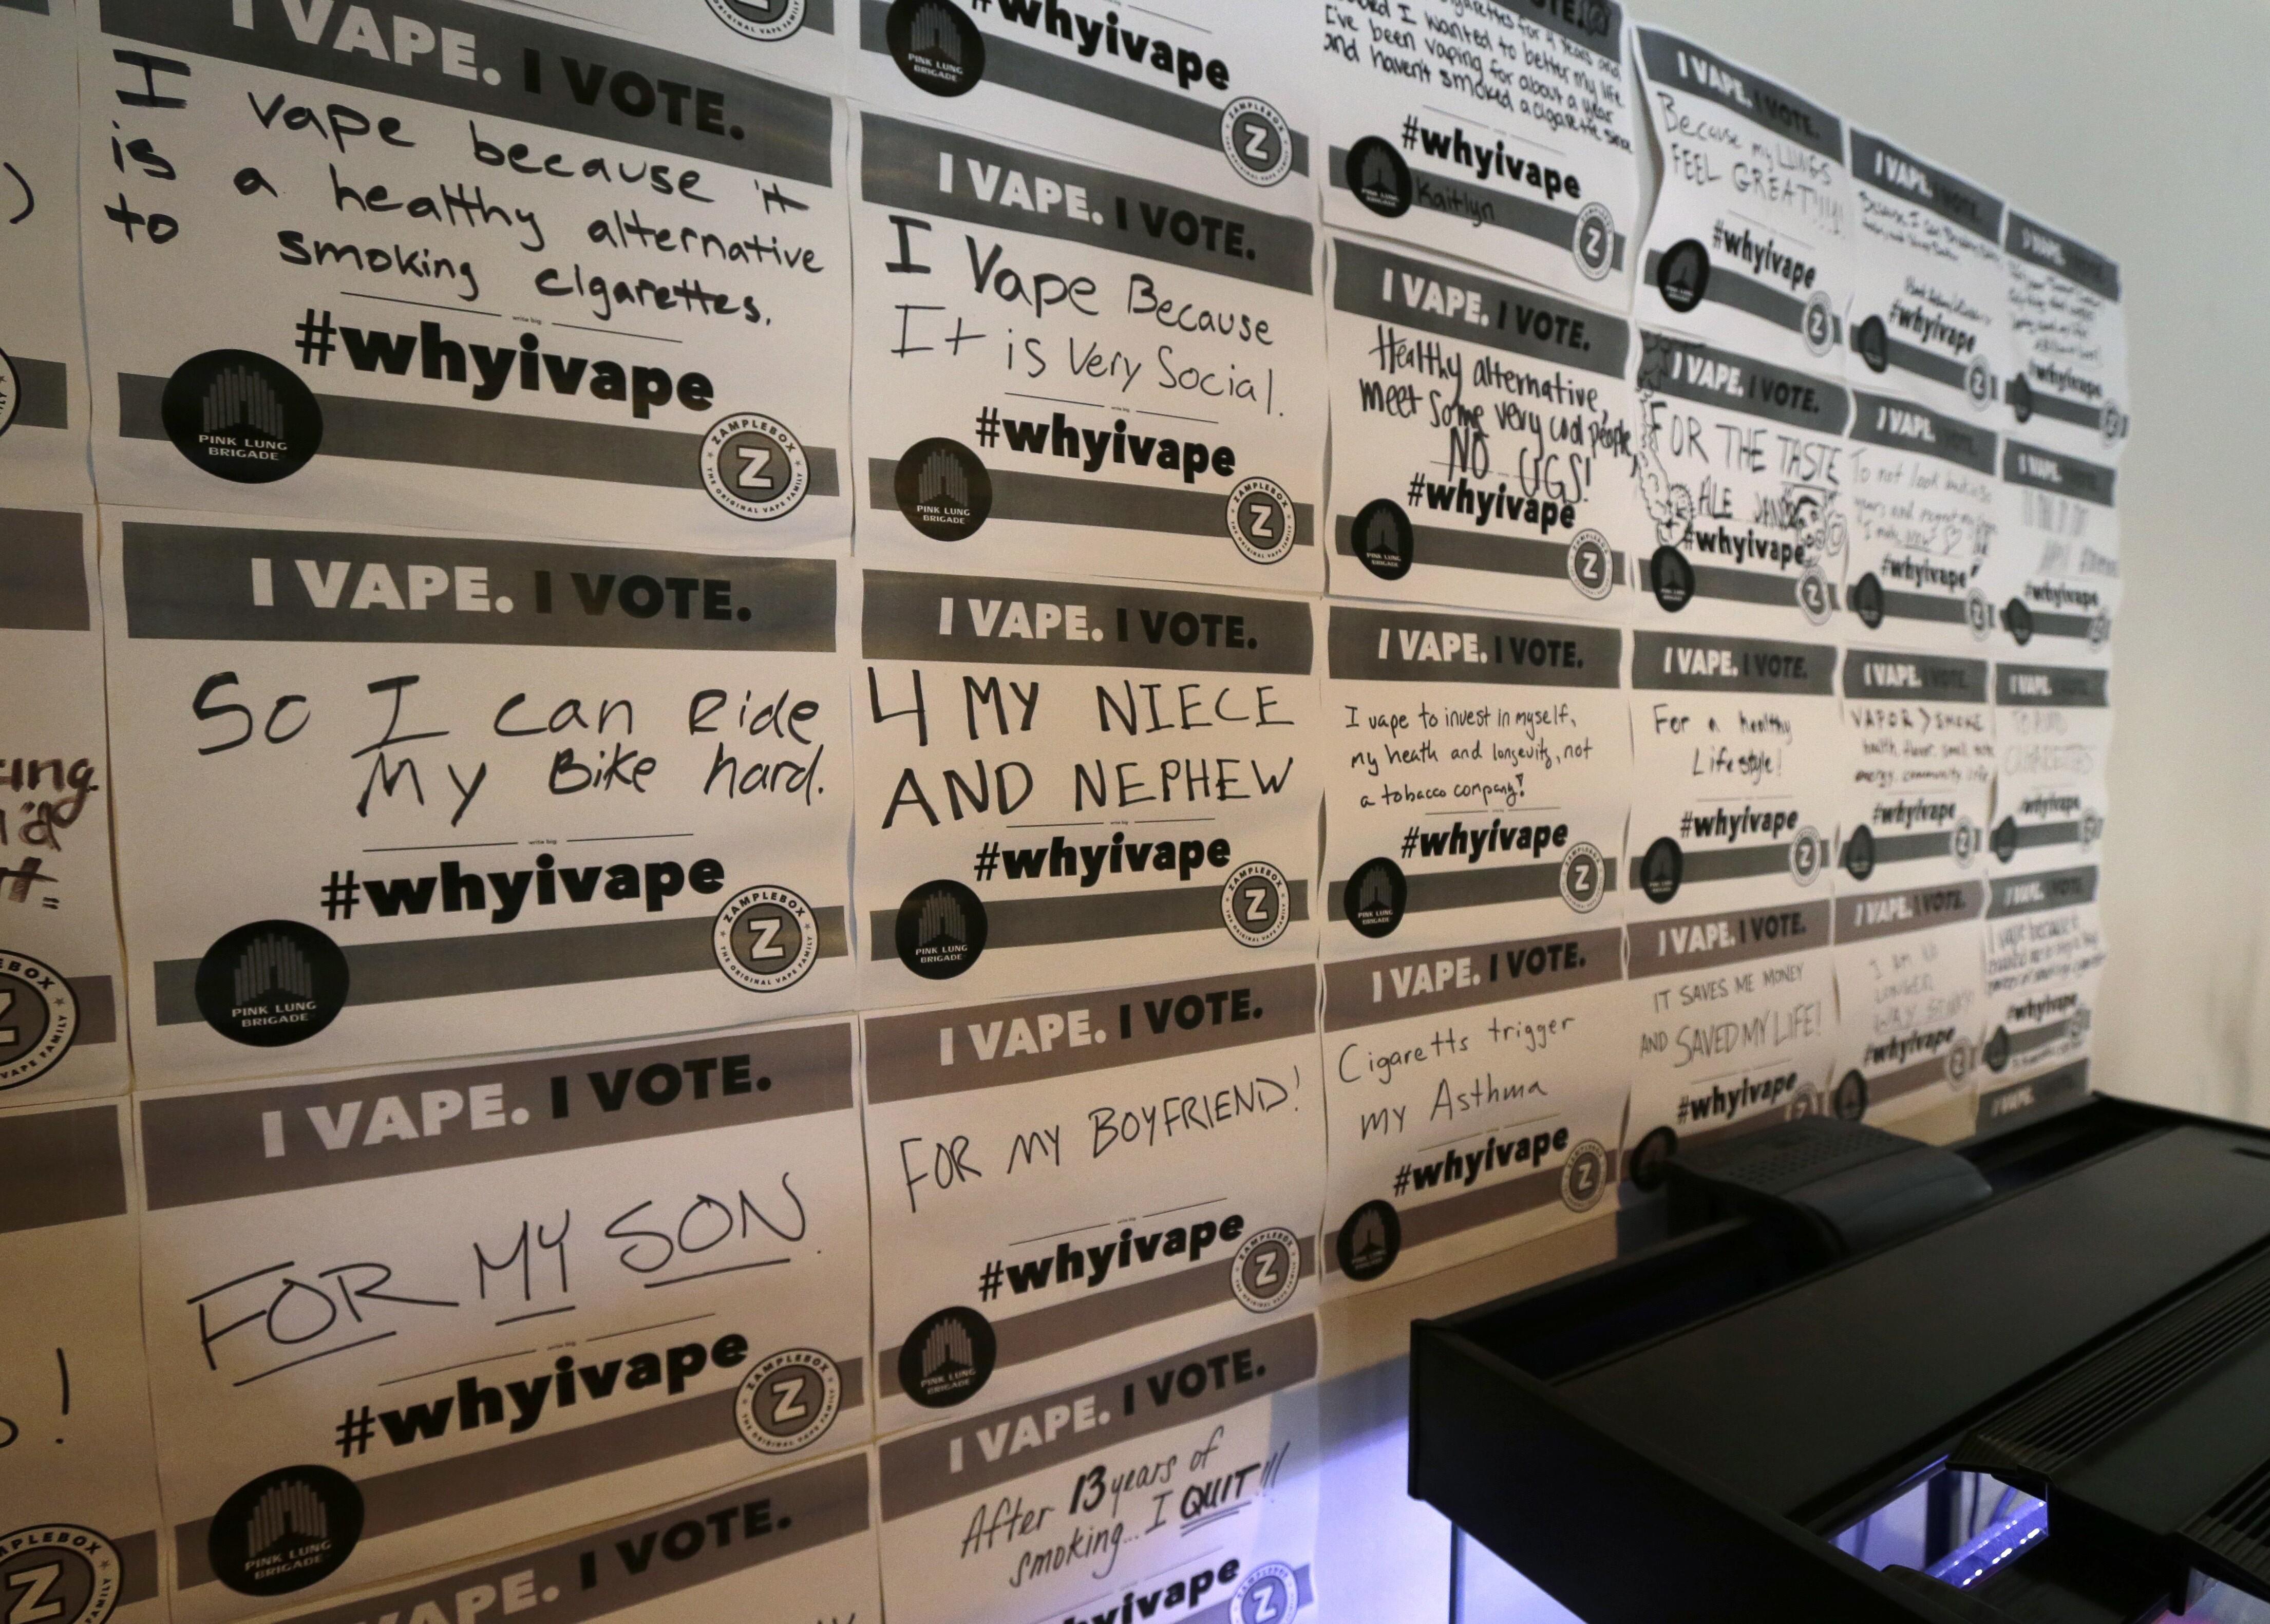 FDA urged to kill Obama's e-cigarette regs, $1M tax on vape